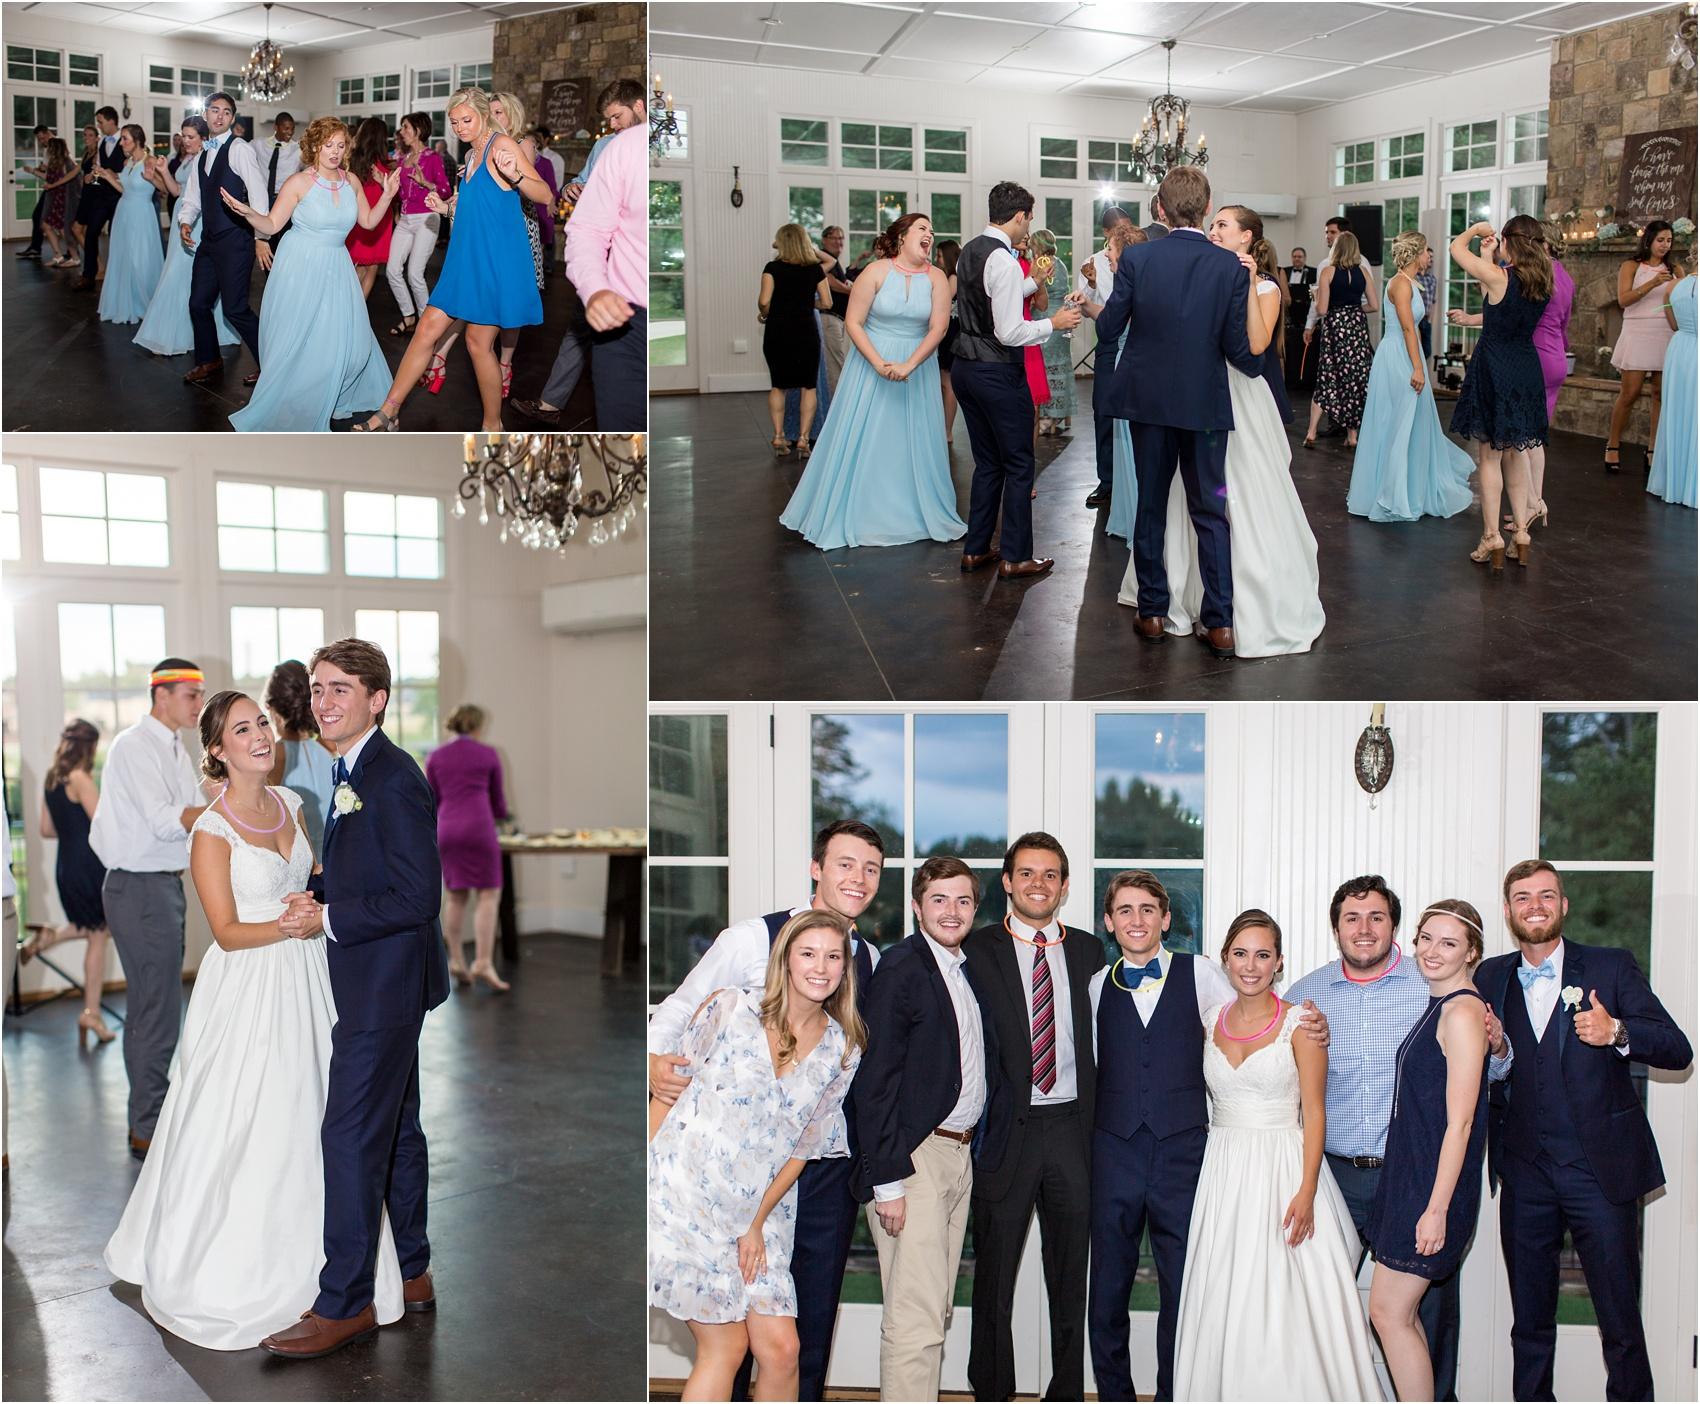 Savannah Eve Photography- Sigl-Adams Wedding- Sneak Peek-87.jpg